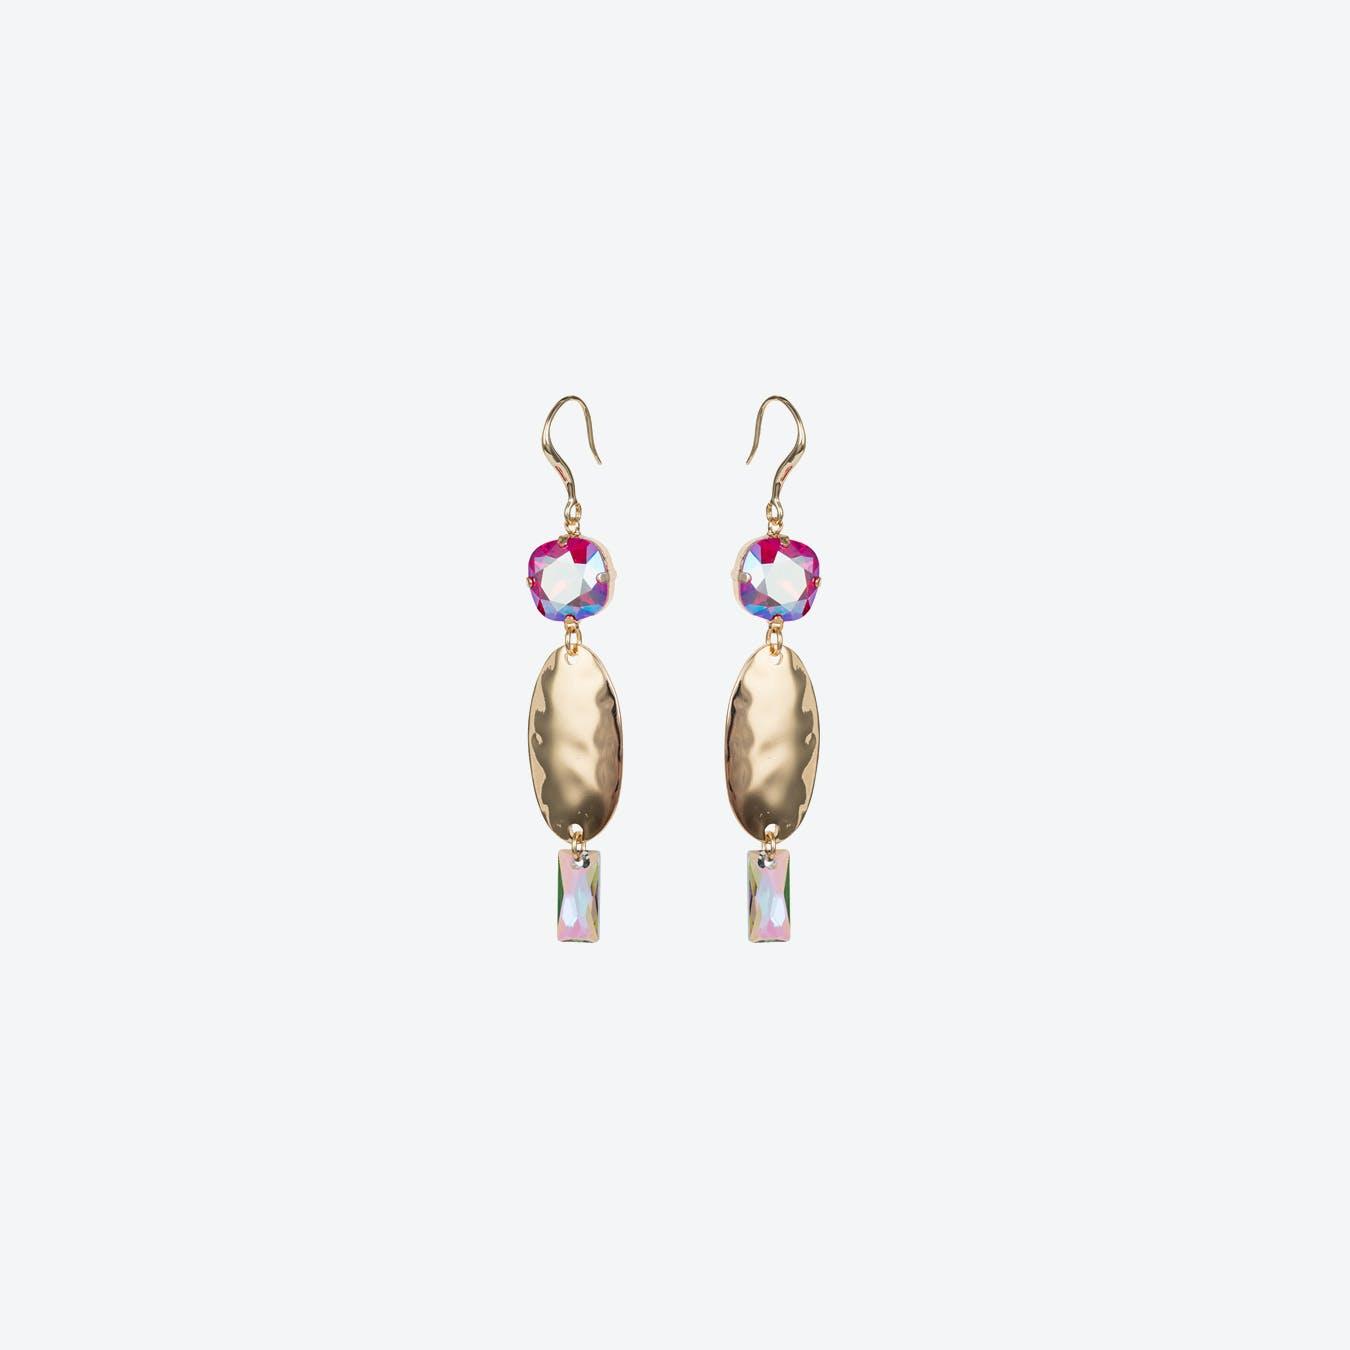 Oval Textured Earrings in Light Siam